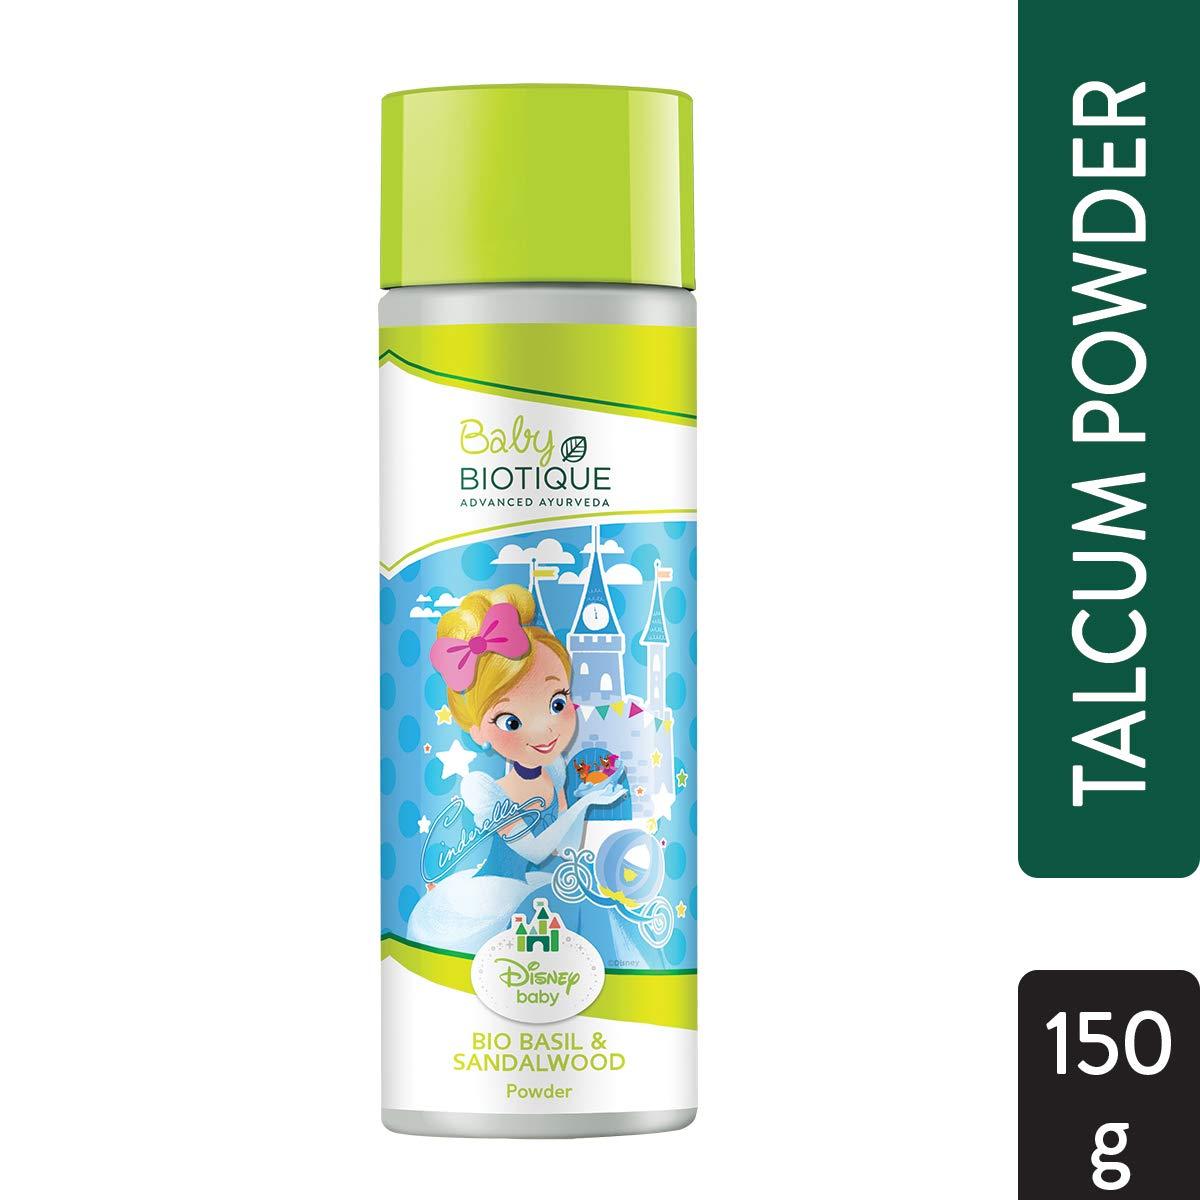 Biotique Basil & Red Sandalwood (Baby Princess) Powder (150 g)